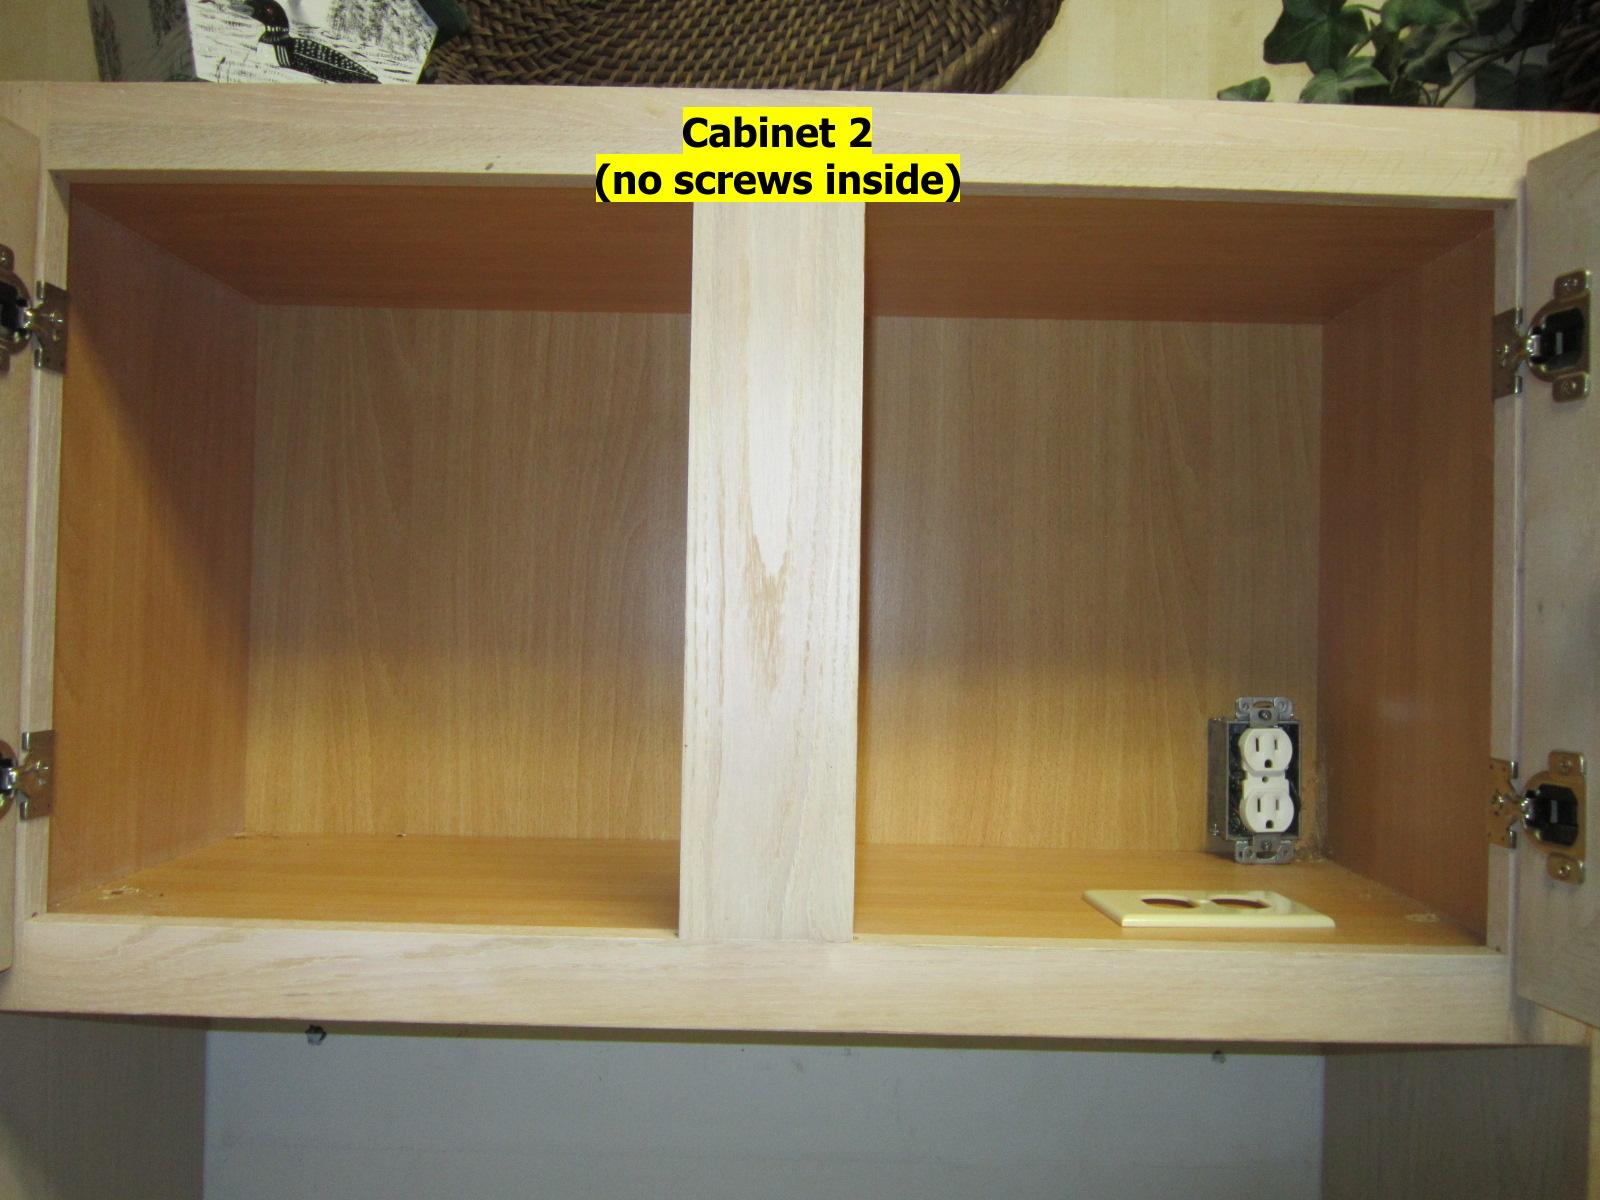 Cabinet Installation - How Many Screws? - Carpentry - DIY ...